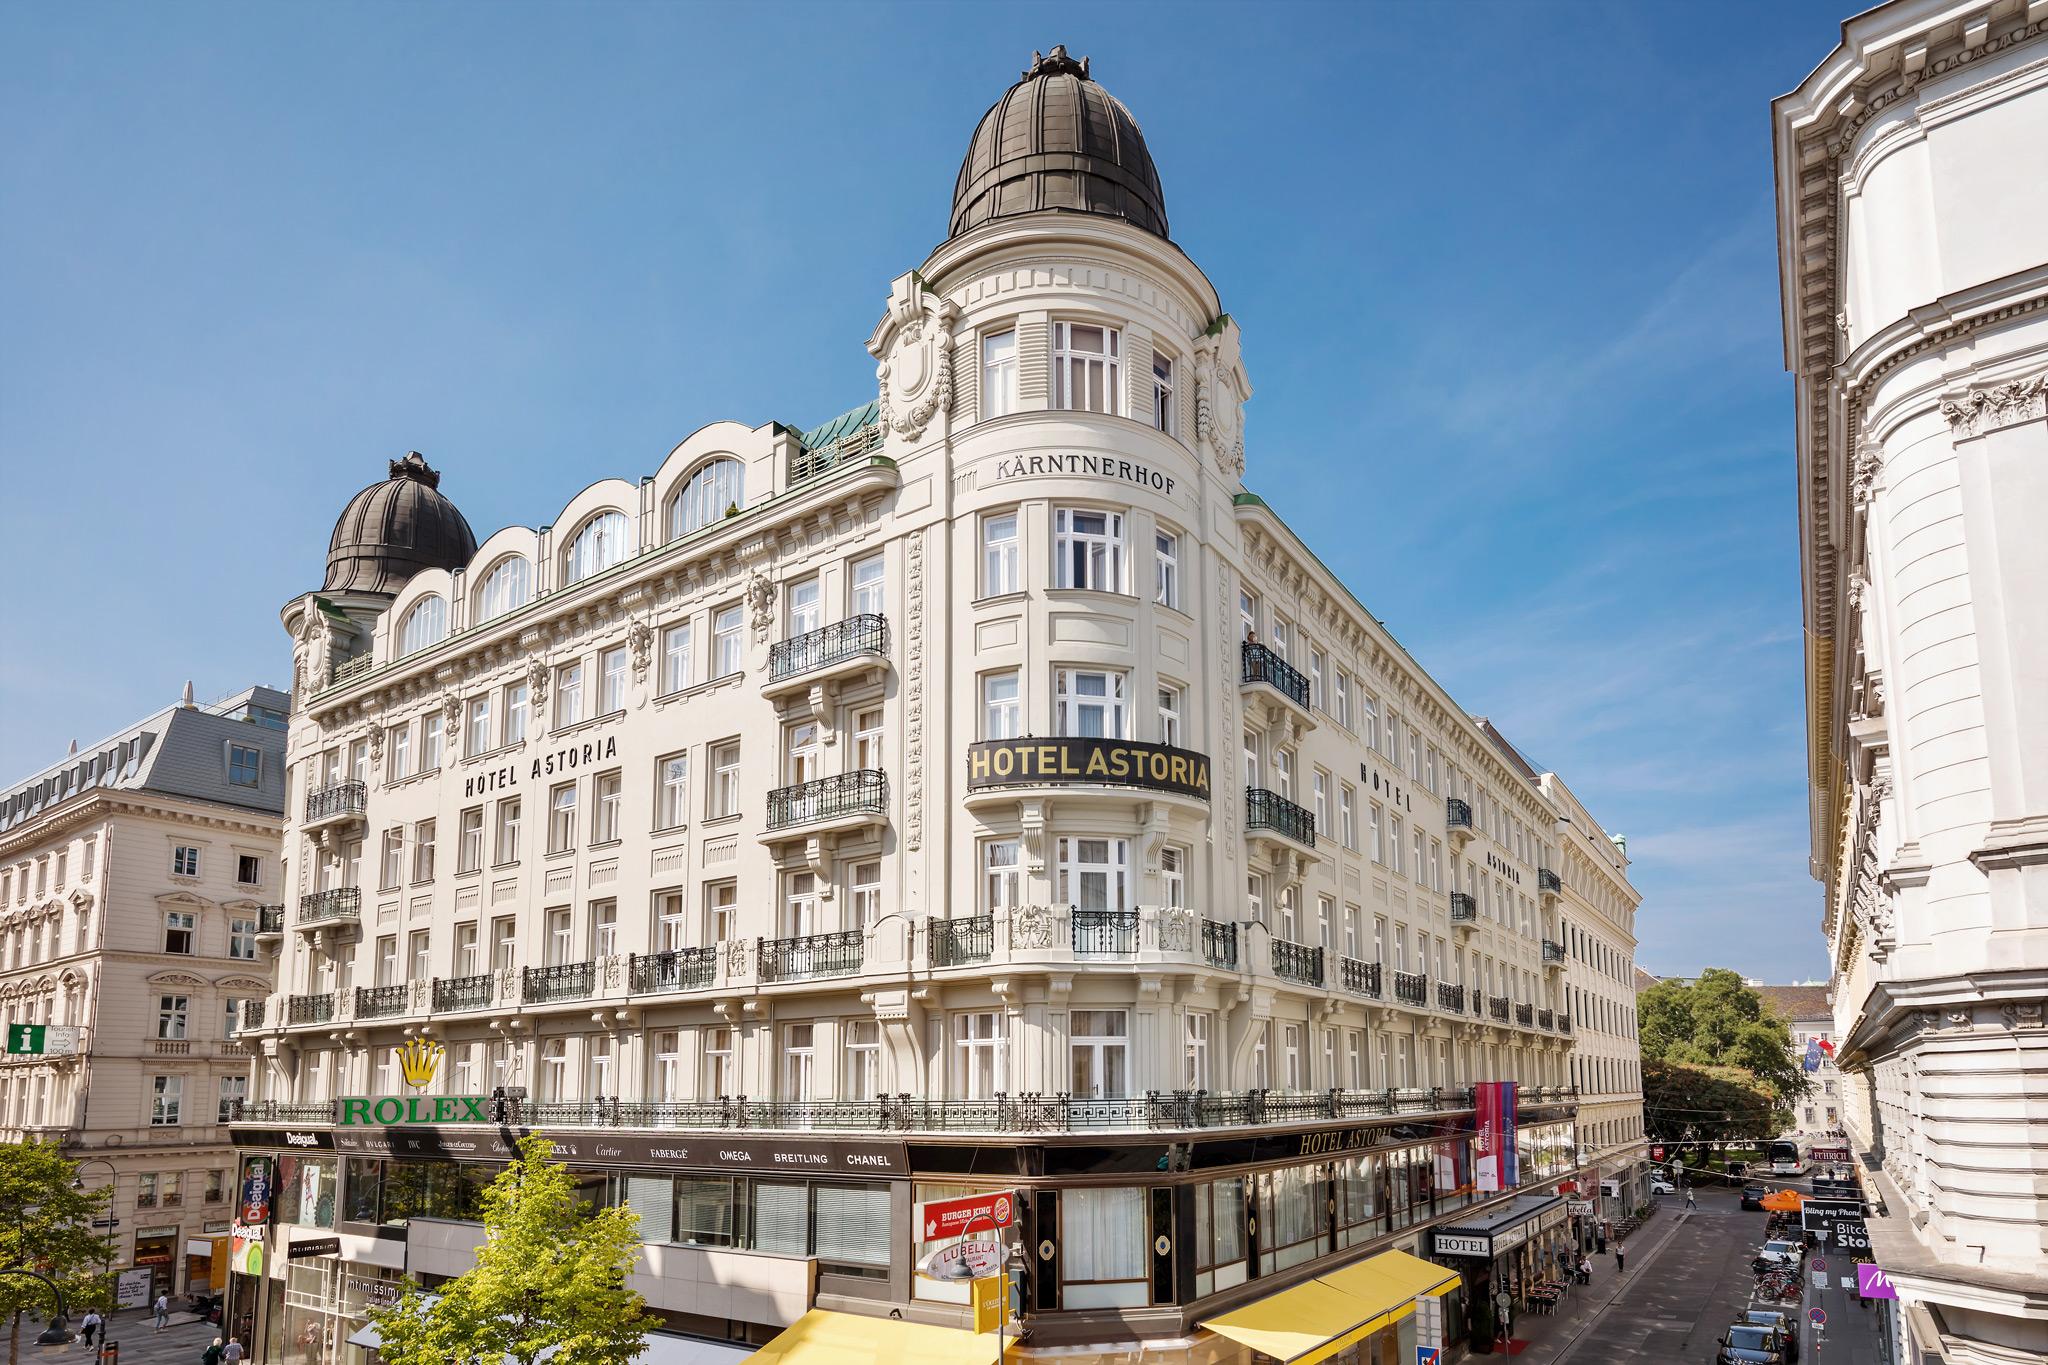 Hotel Astoria 4 Sterne Hotel In Wiens Innenstadt